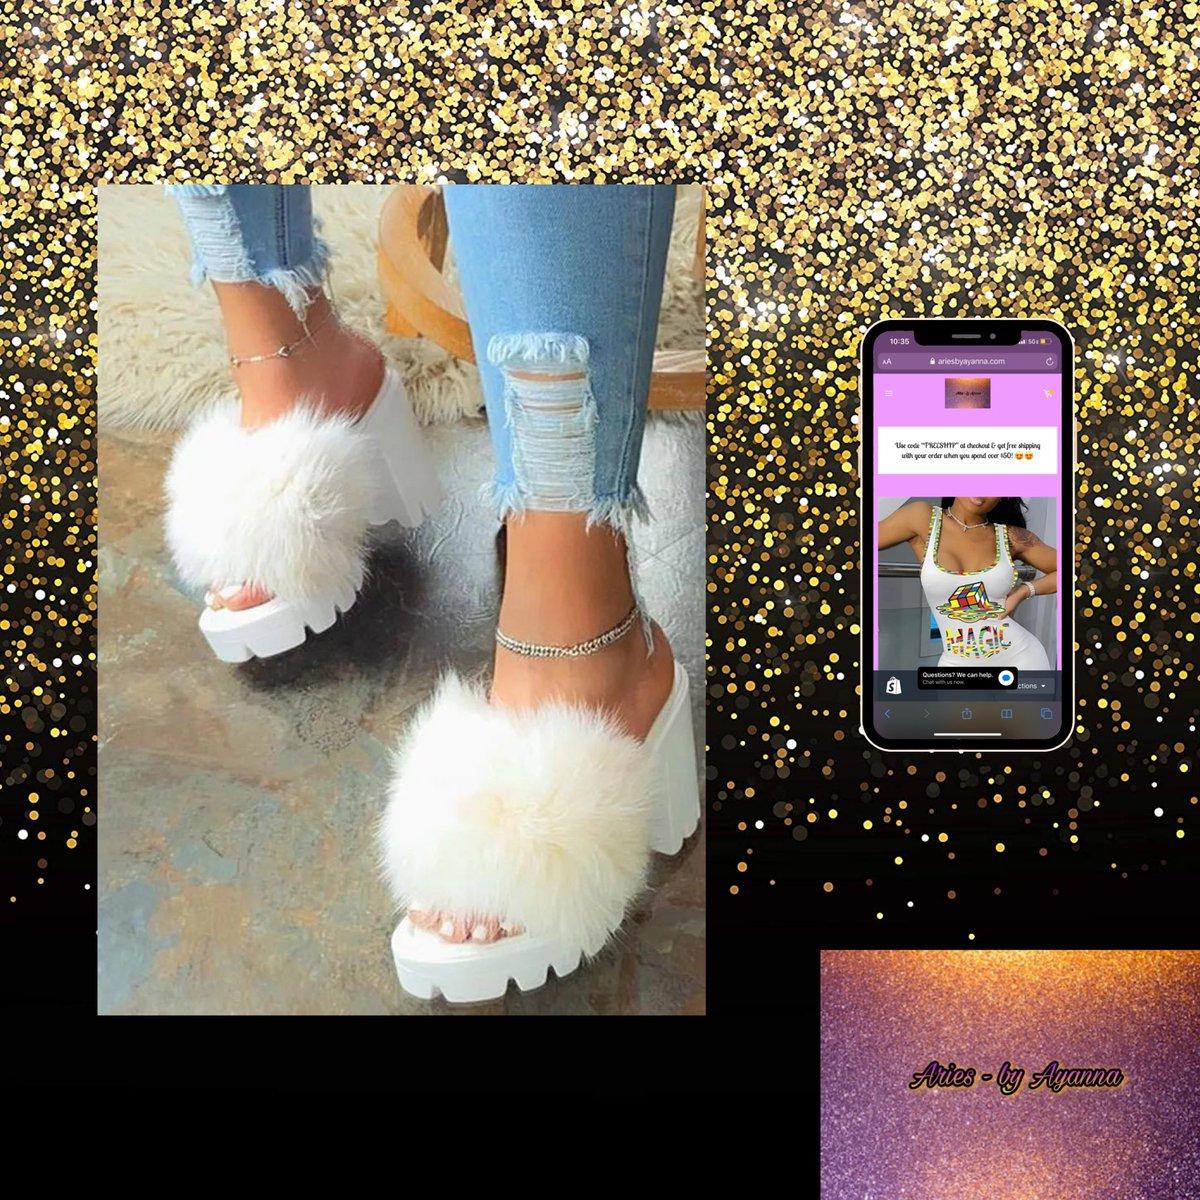 New! White fluff chunky high heels  To purchase/shop now visit http://ariesbyayanna.com #fashion #shopping #clothes #dress #shop #love #blackbusiness  #slides #sandals #furslides #summer #summertimepic.twitter.com/MoU68hltz8